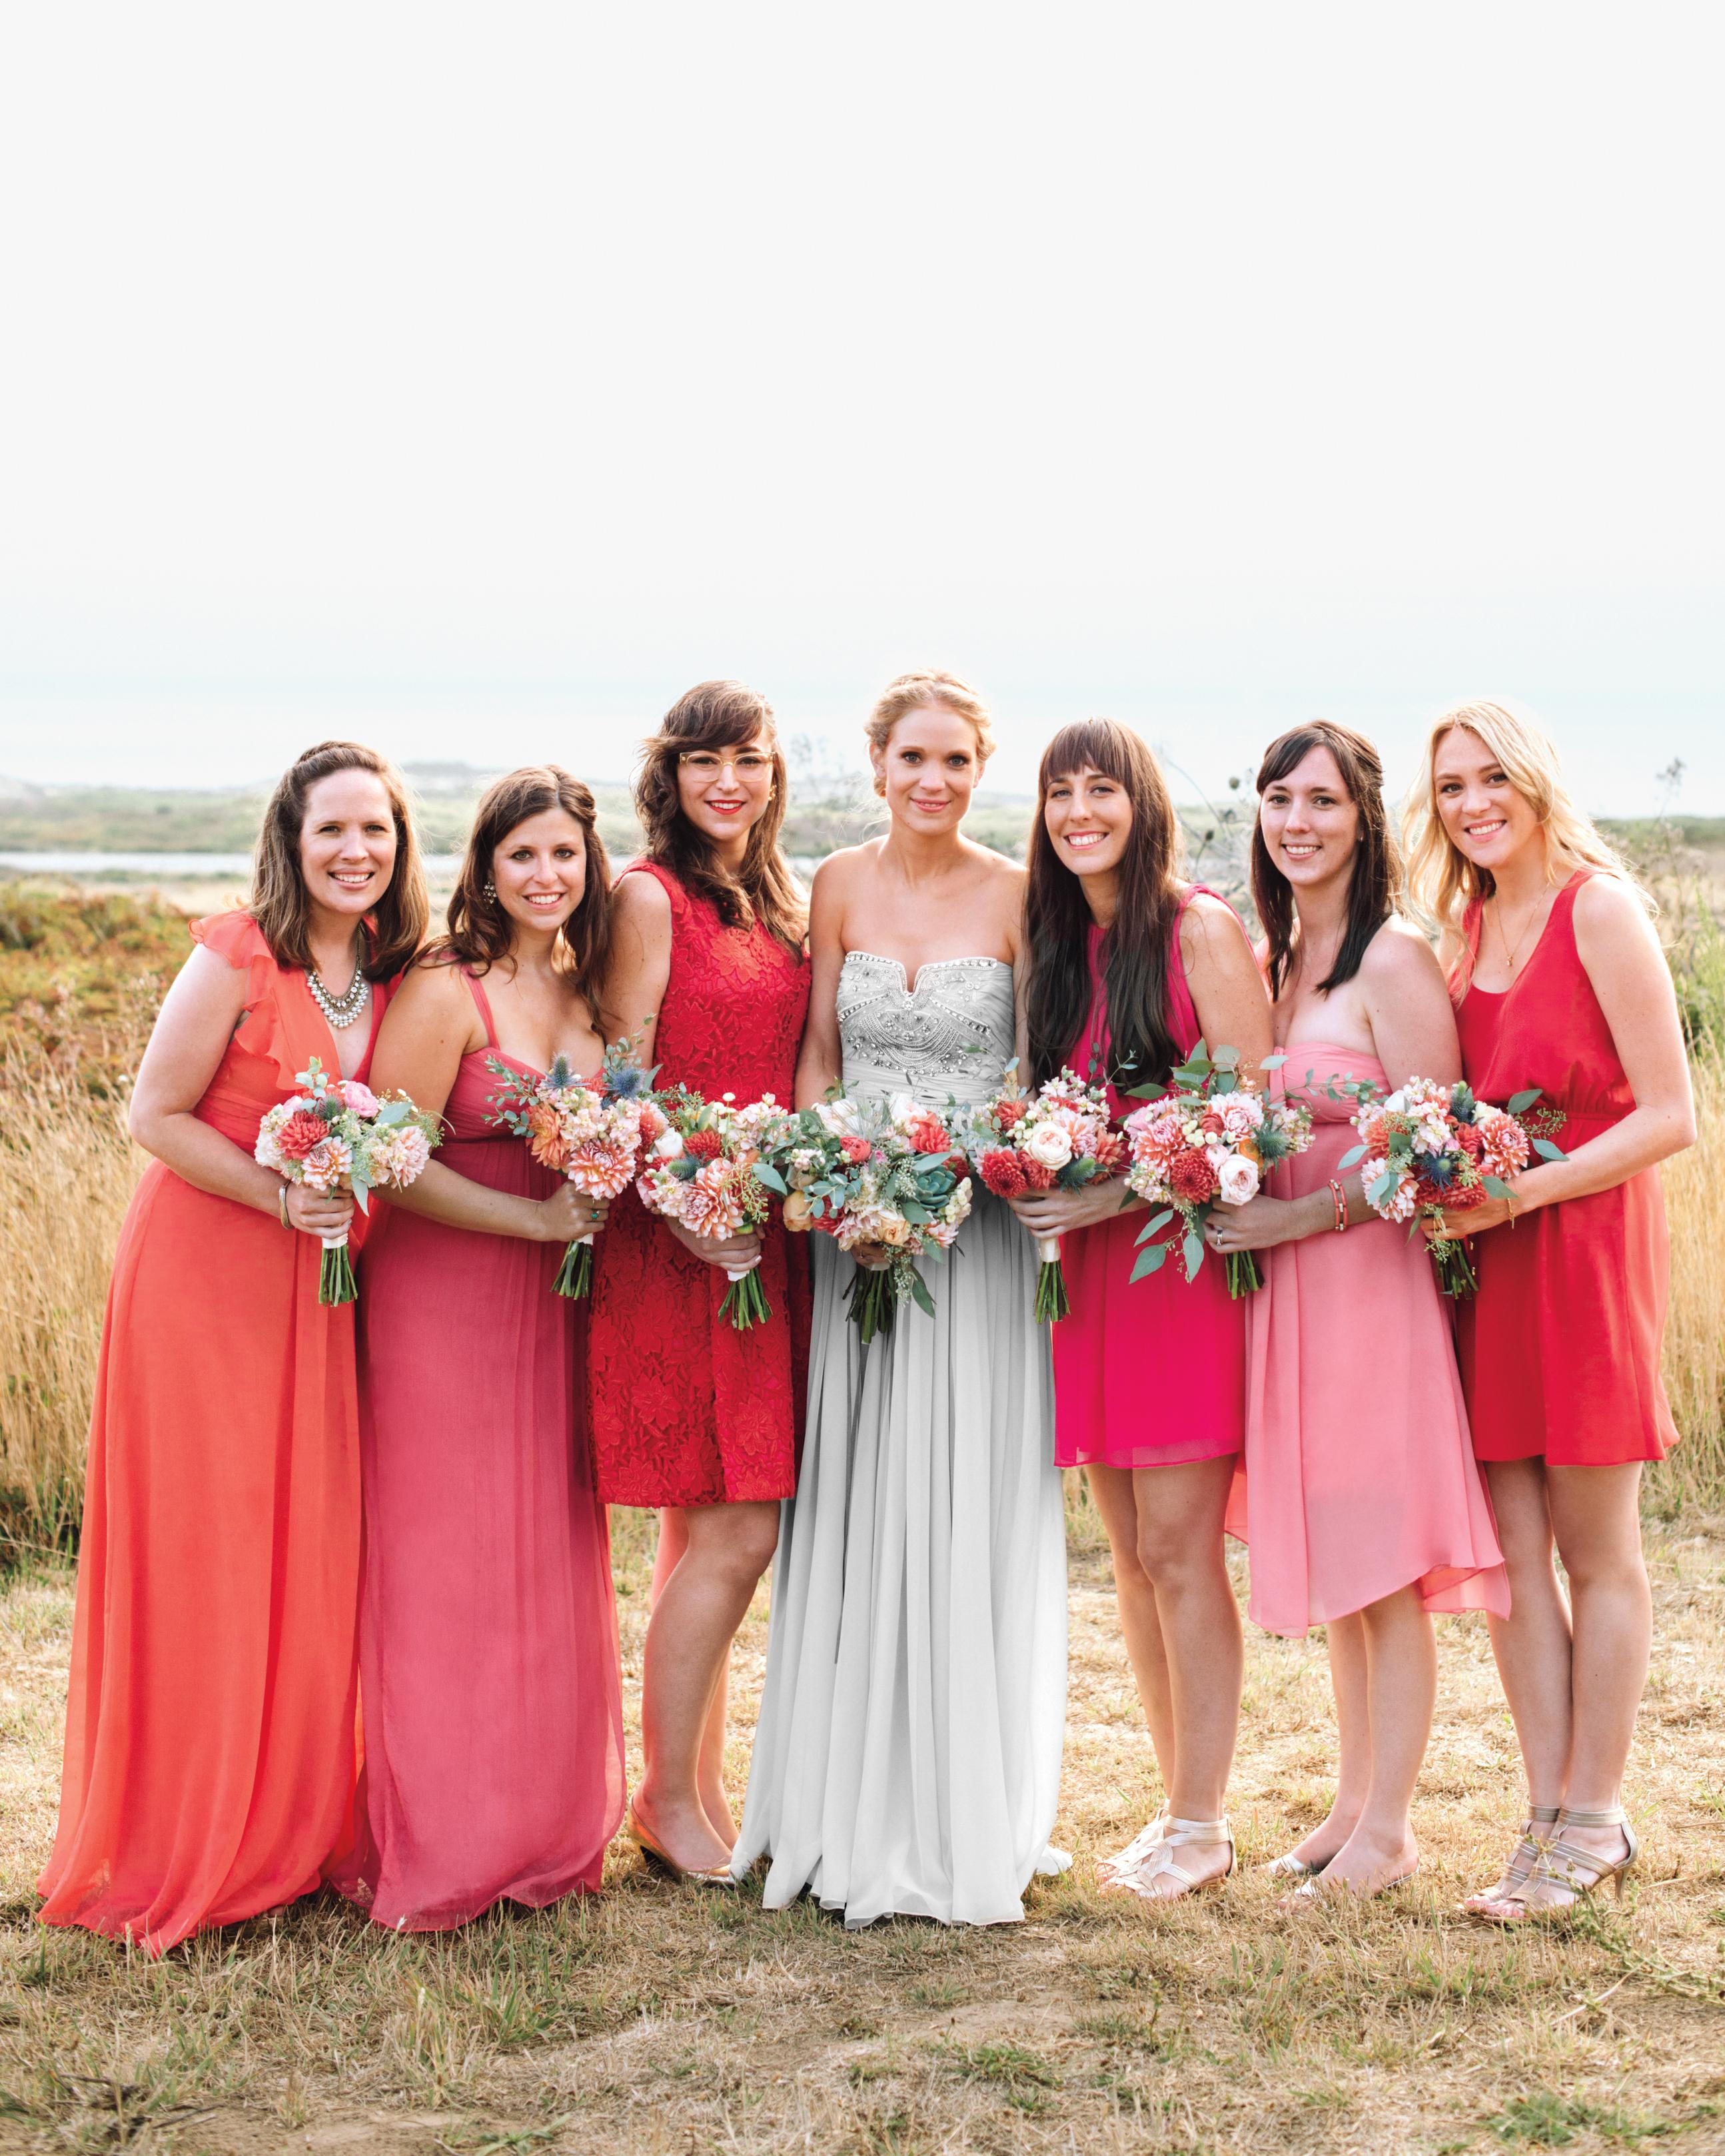 anna-timothy-bridesmaids-2004-mwds109912.jpg